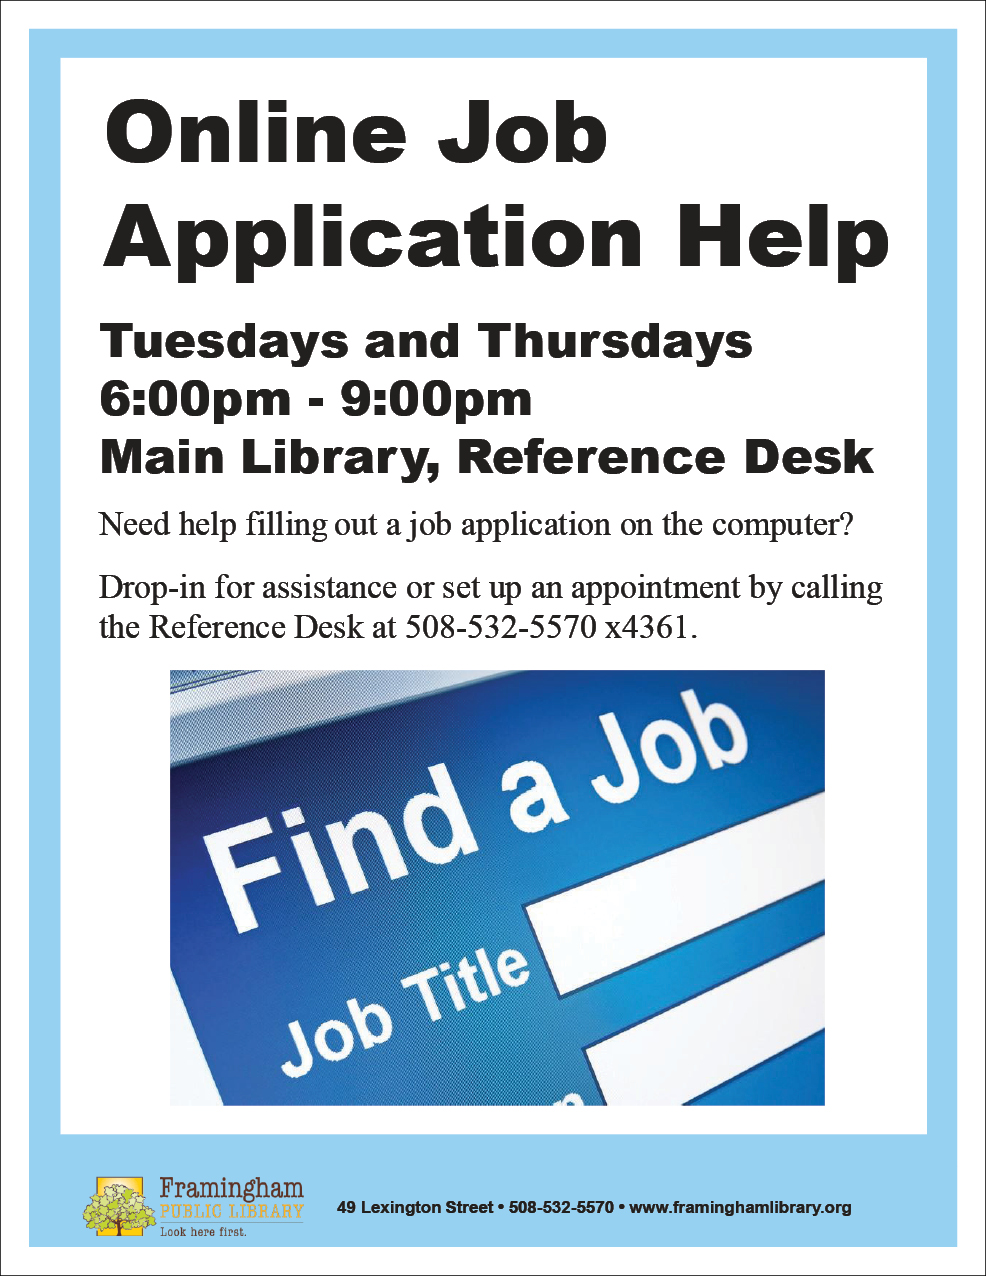 online job application help services framingham public library online job help jpg